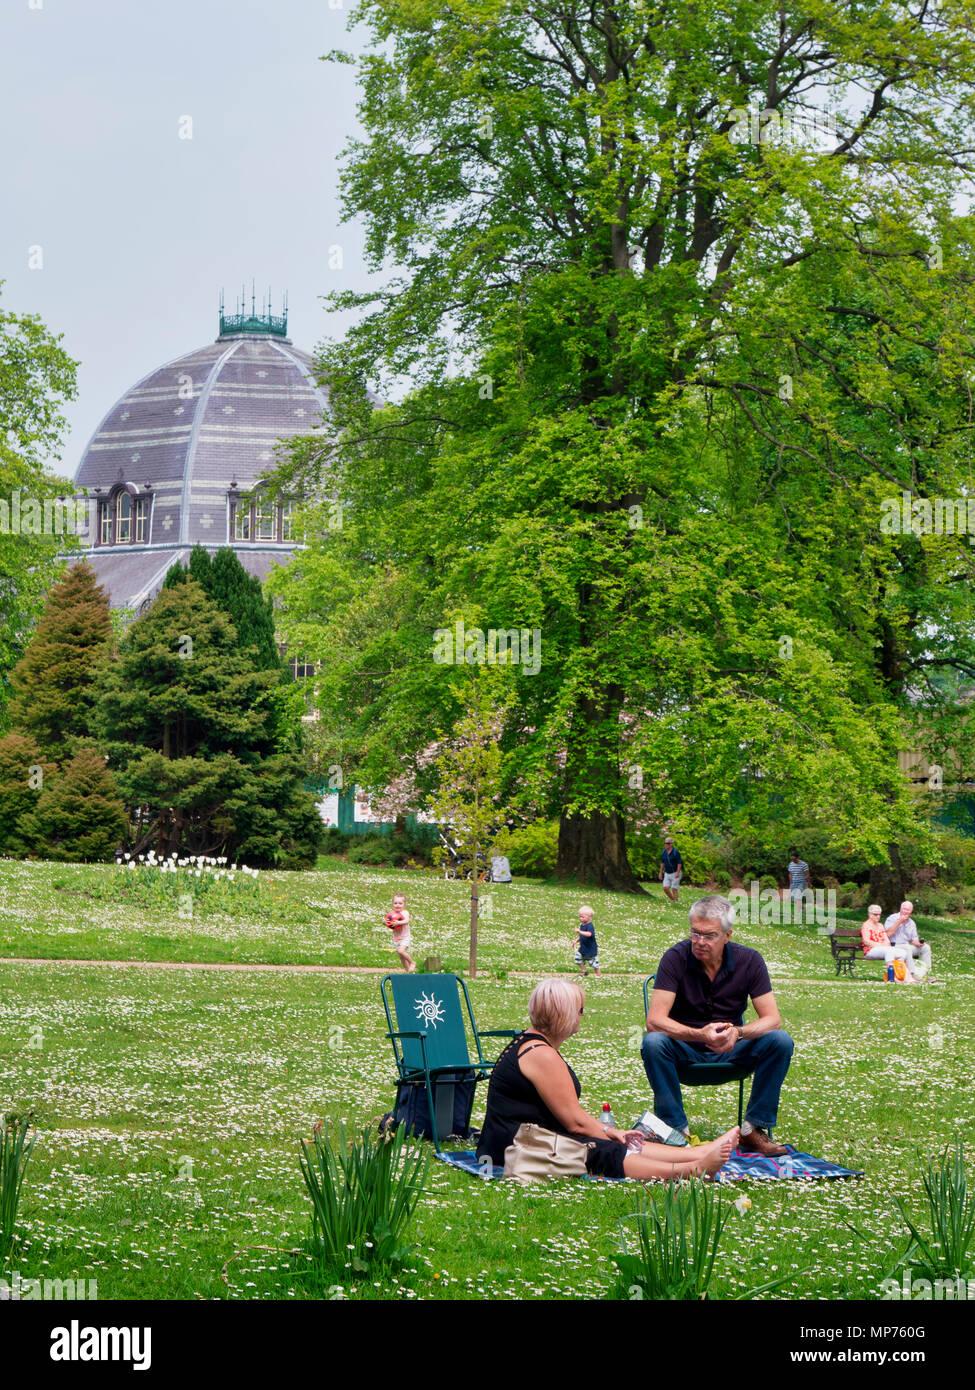 Buxton Victorian Pavilion Gardens, UK. 21st may 2018. Weather UK: People enjoying the warm summer sunshine in the Buxton Victorian Pavilion Gardens, Derbyshire Credit: Doug Blane/Alamy Live News - Stock Image